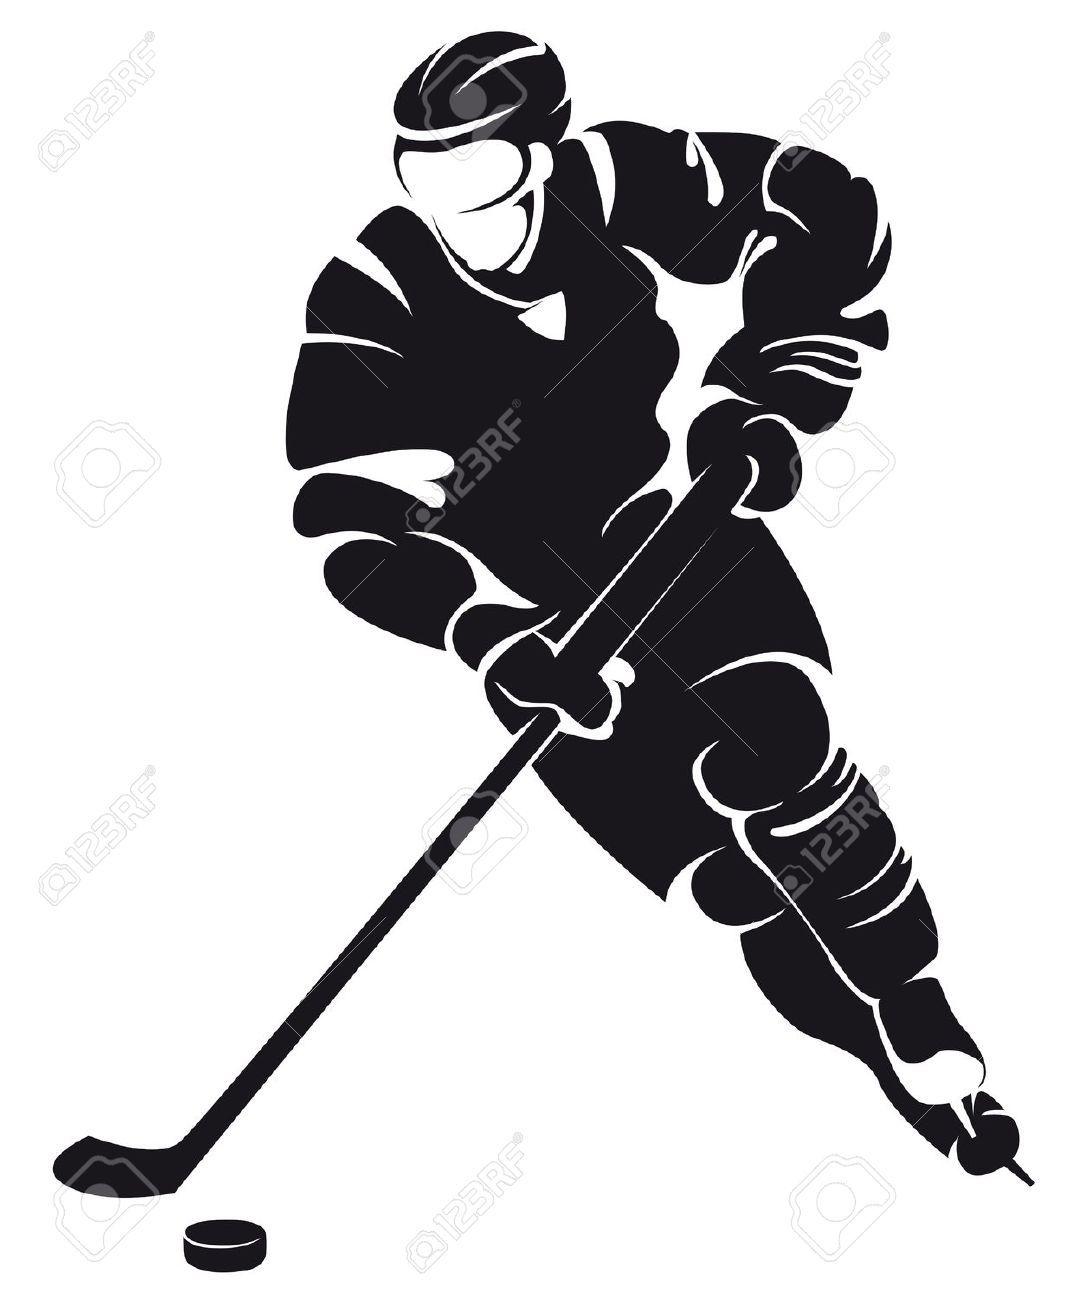 Hockey clipart free 3 » Clipart Station.